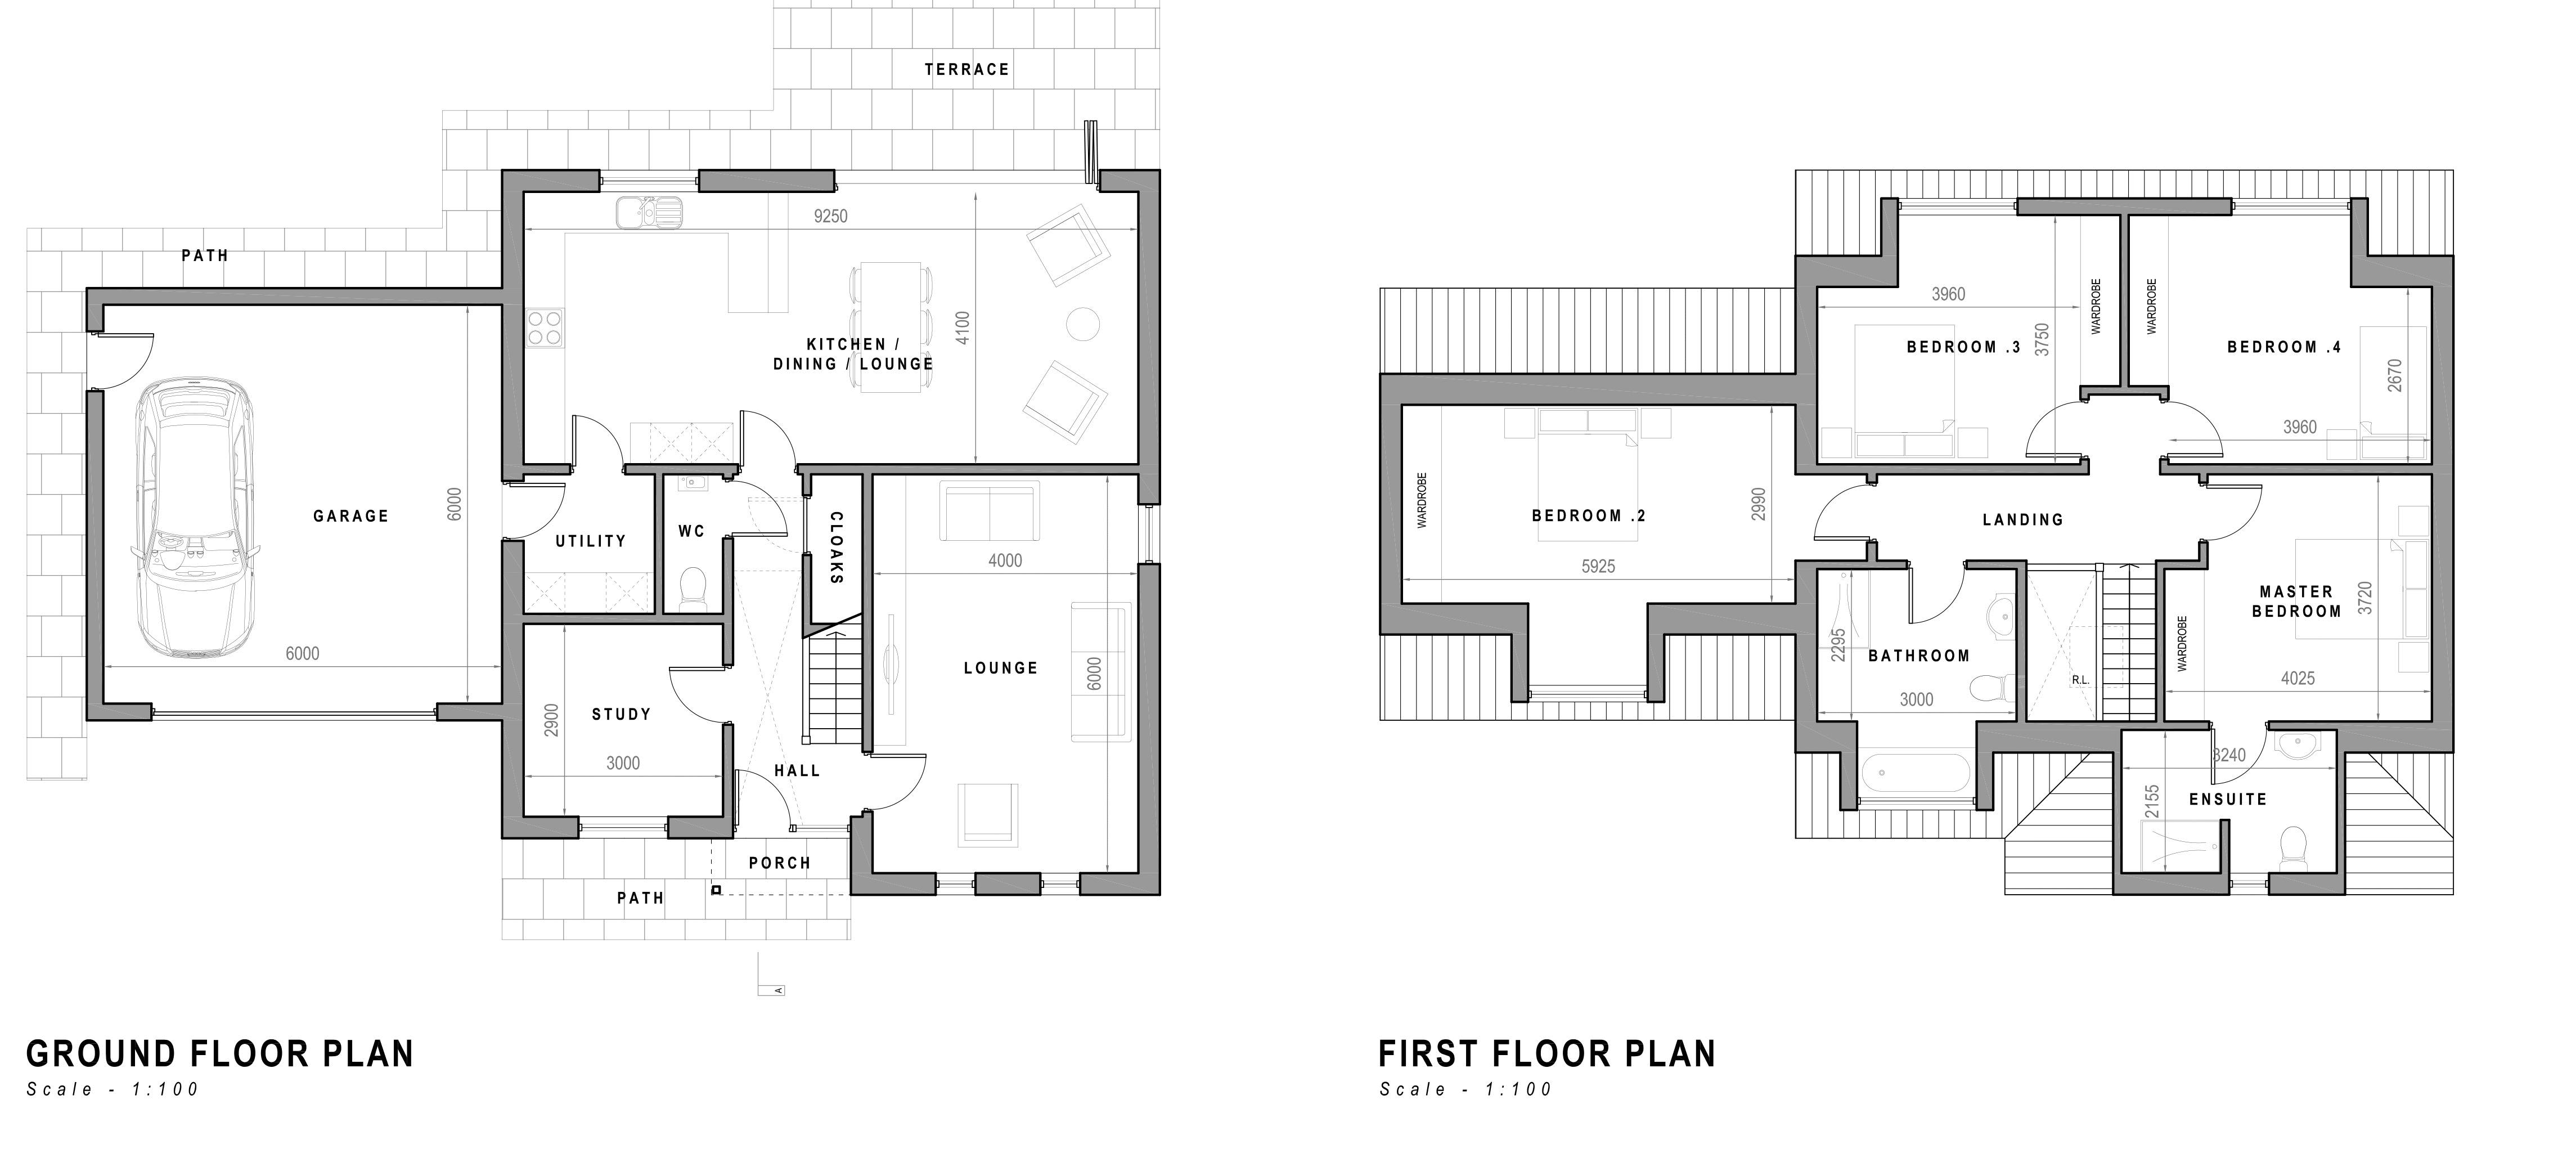 Rear of 41 Floor plan